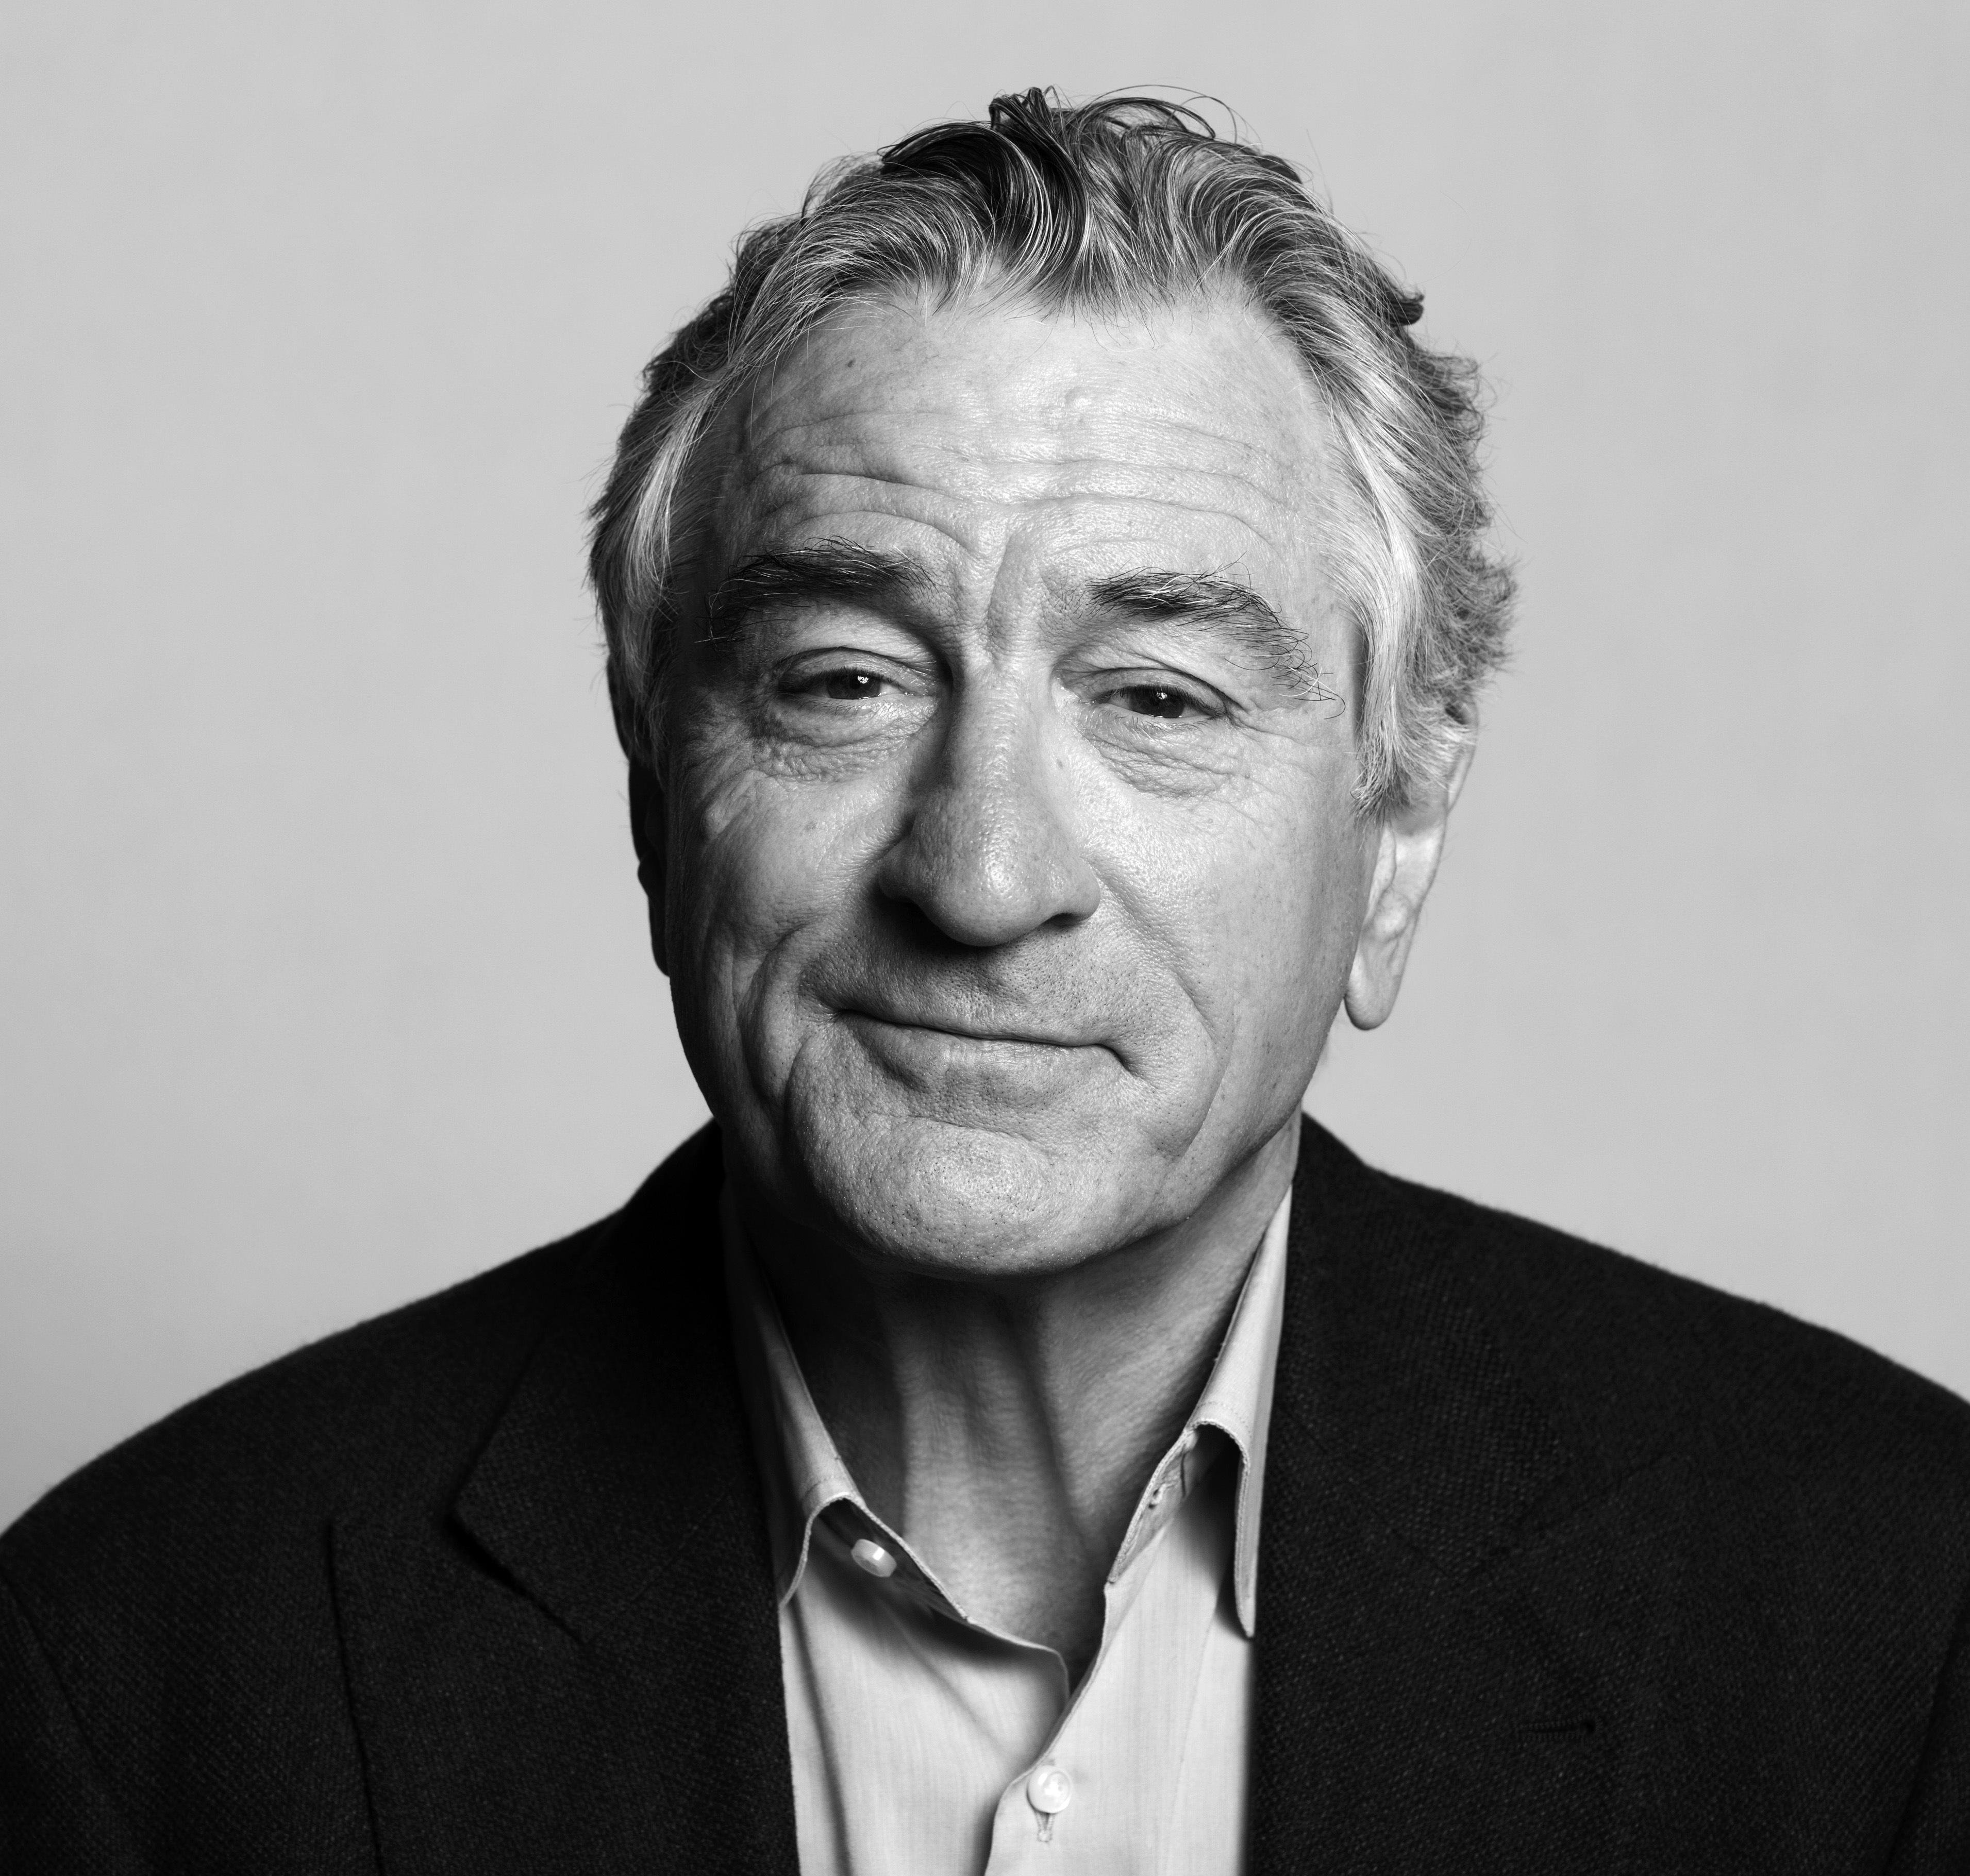 CORRECTING and REPLACING Robert De Niro to Keynote 2018 ...